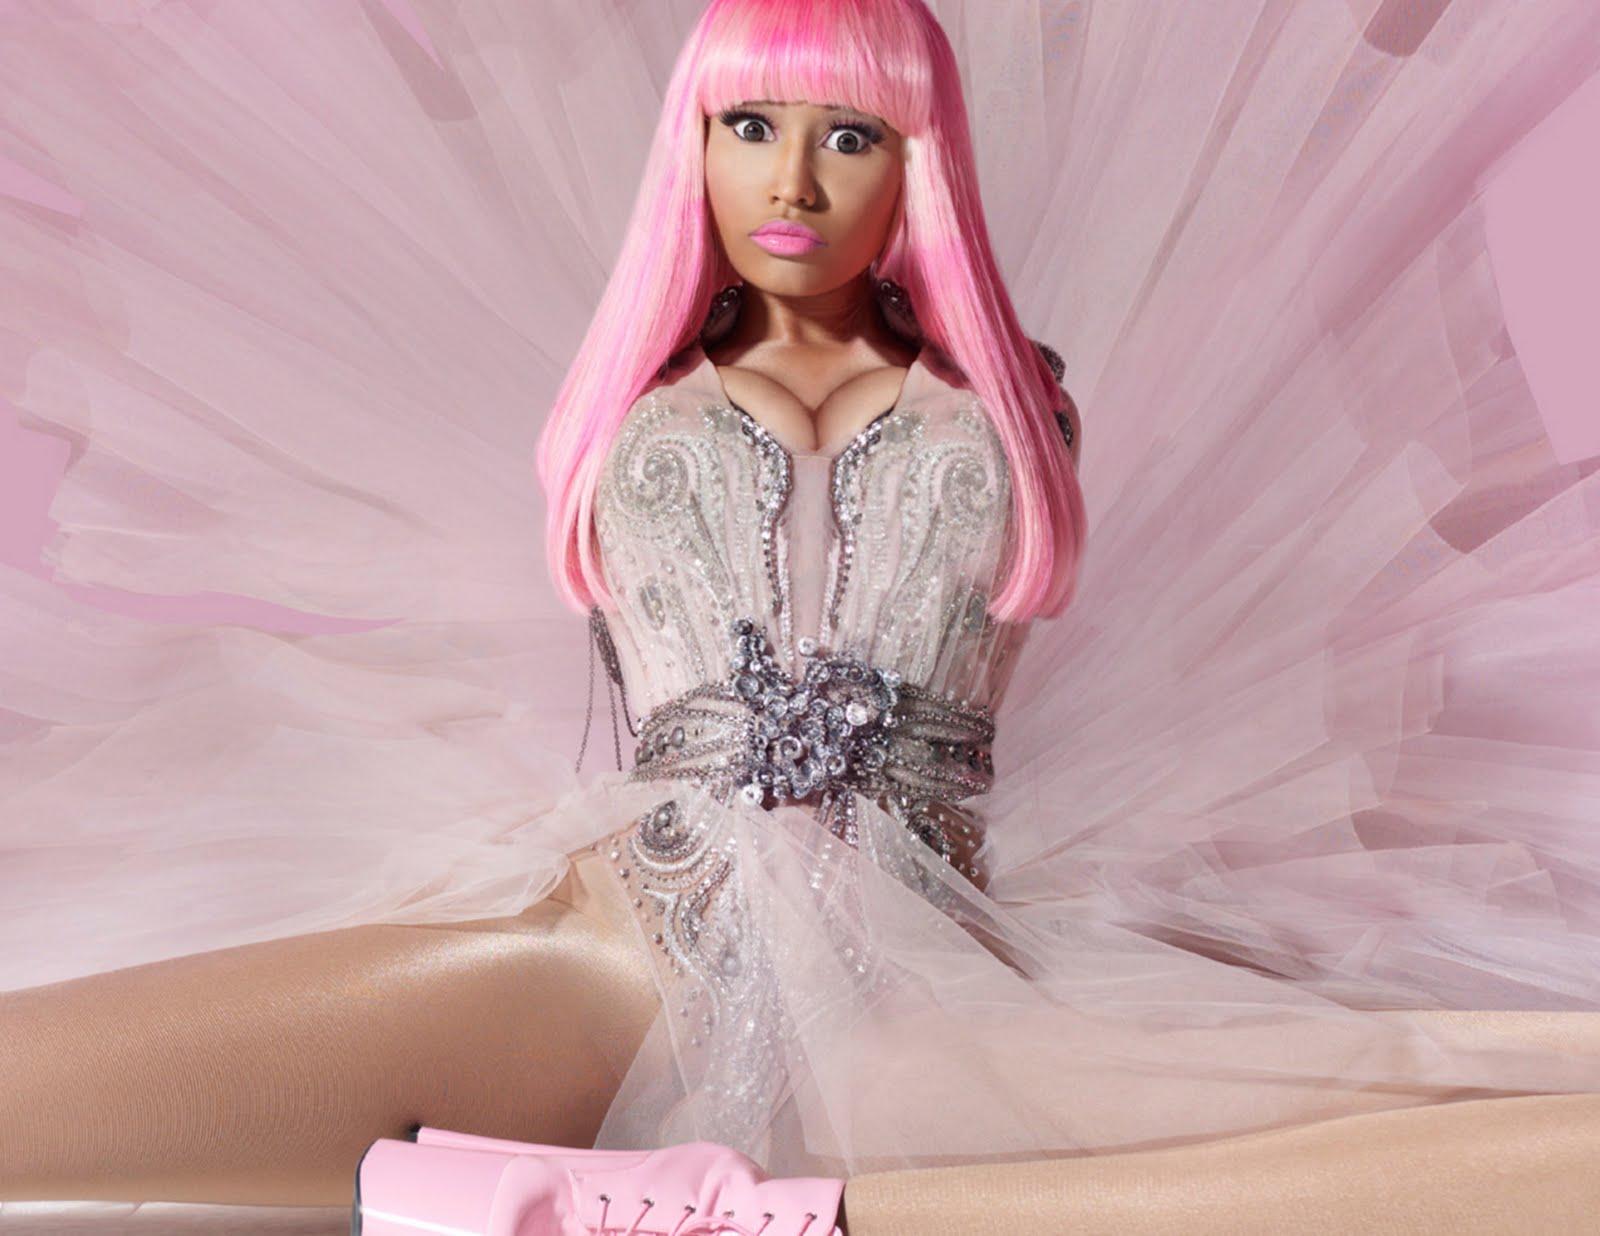 M.A.C Pink Friday Nicki Minaj young teen homemade sex movie